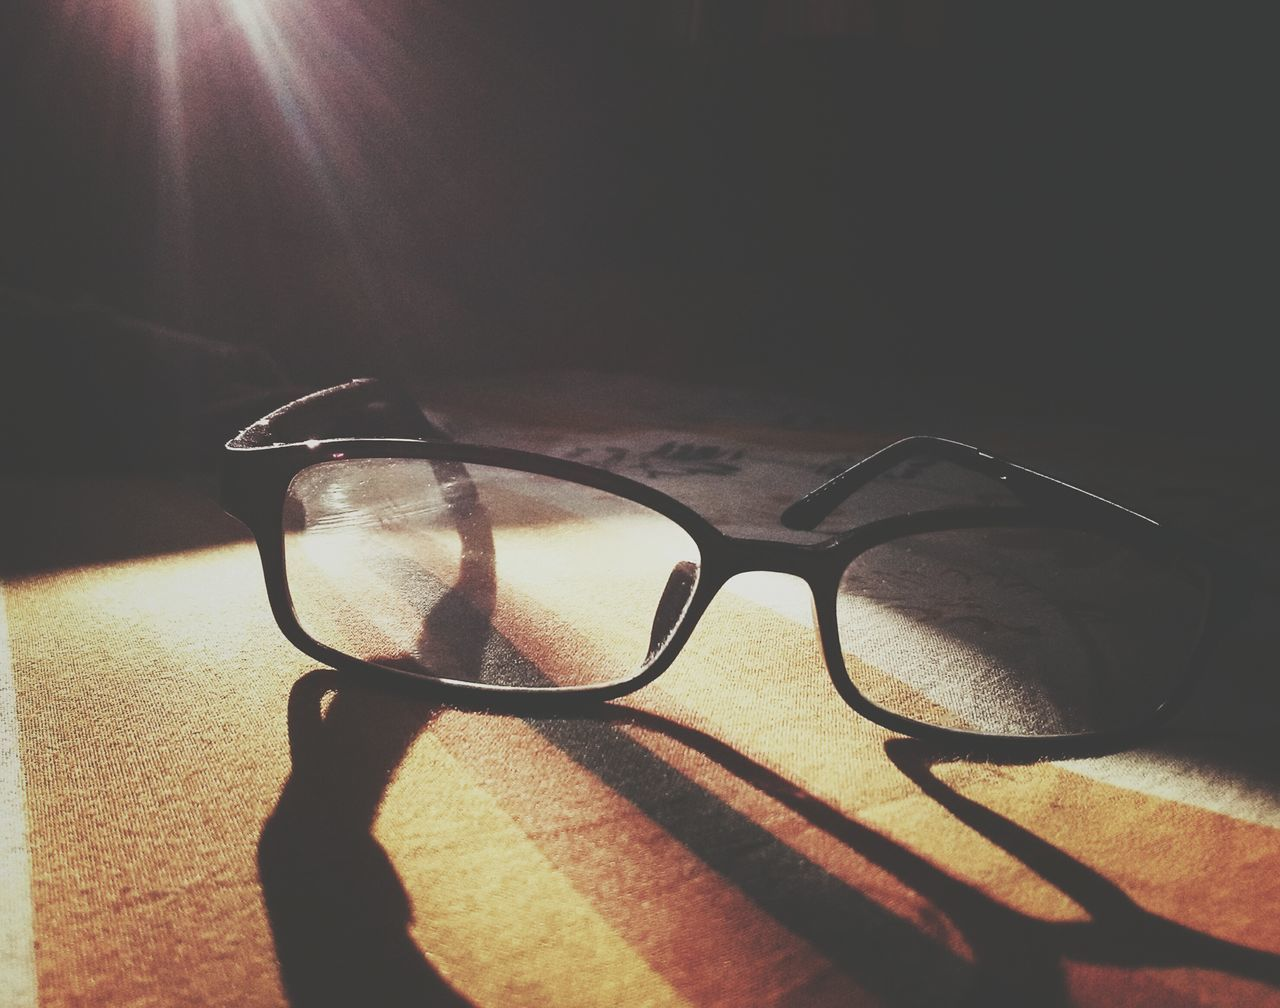 sunglasses, eyeglasses, shadow, eyewear, glasses, sunlight, eyesight, vision, table, no people, indoors, close-up, day